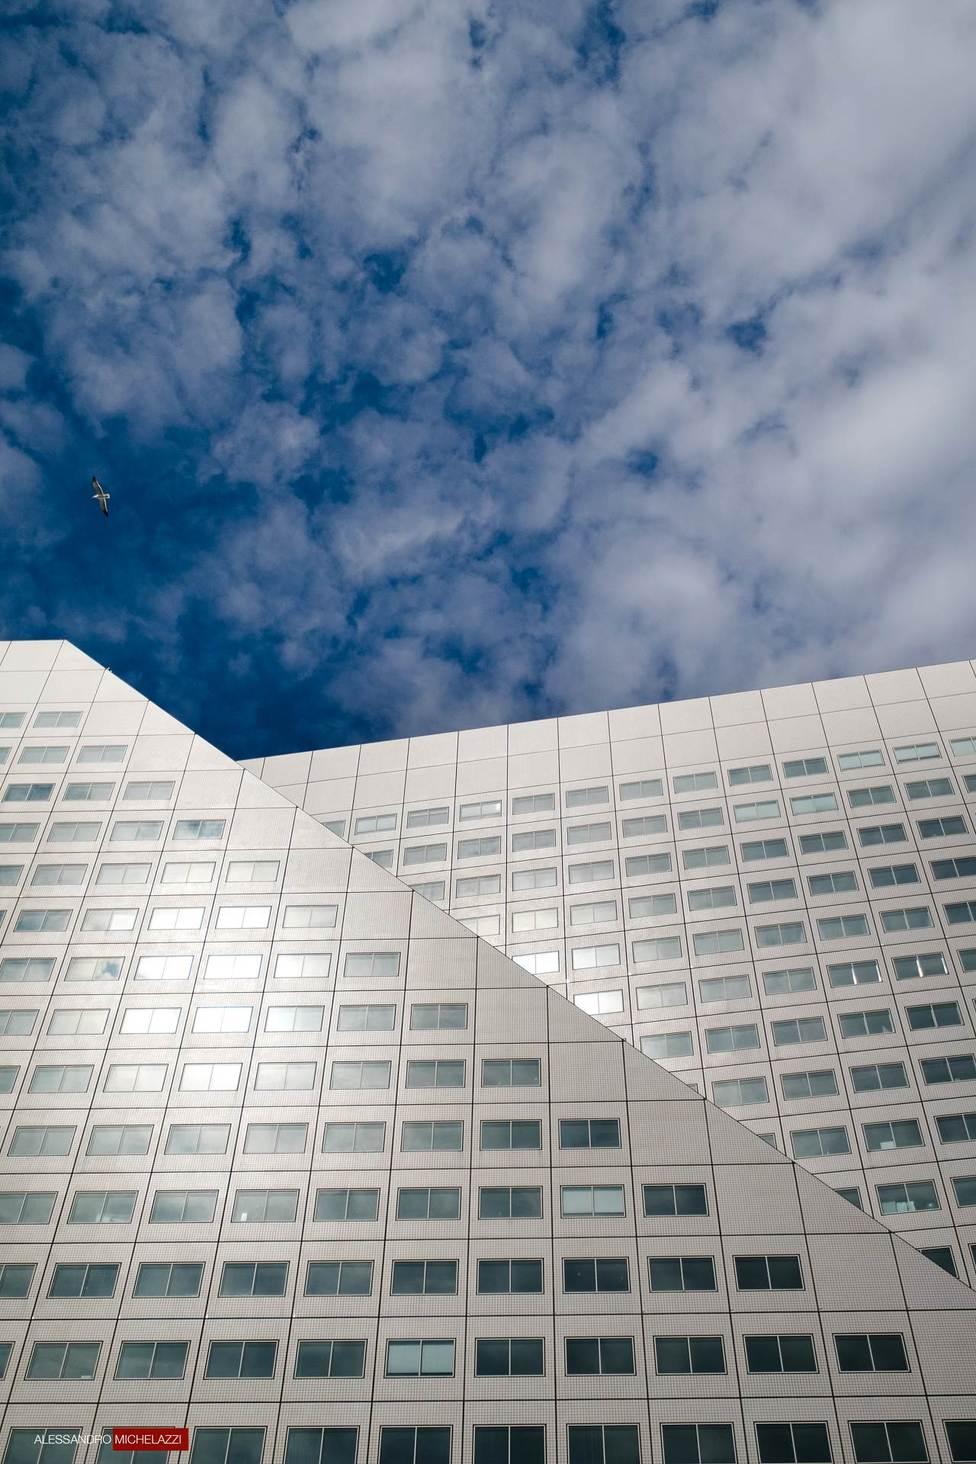 Rotterdam-Photography-Alessandro-Michelazzi-6